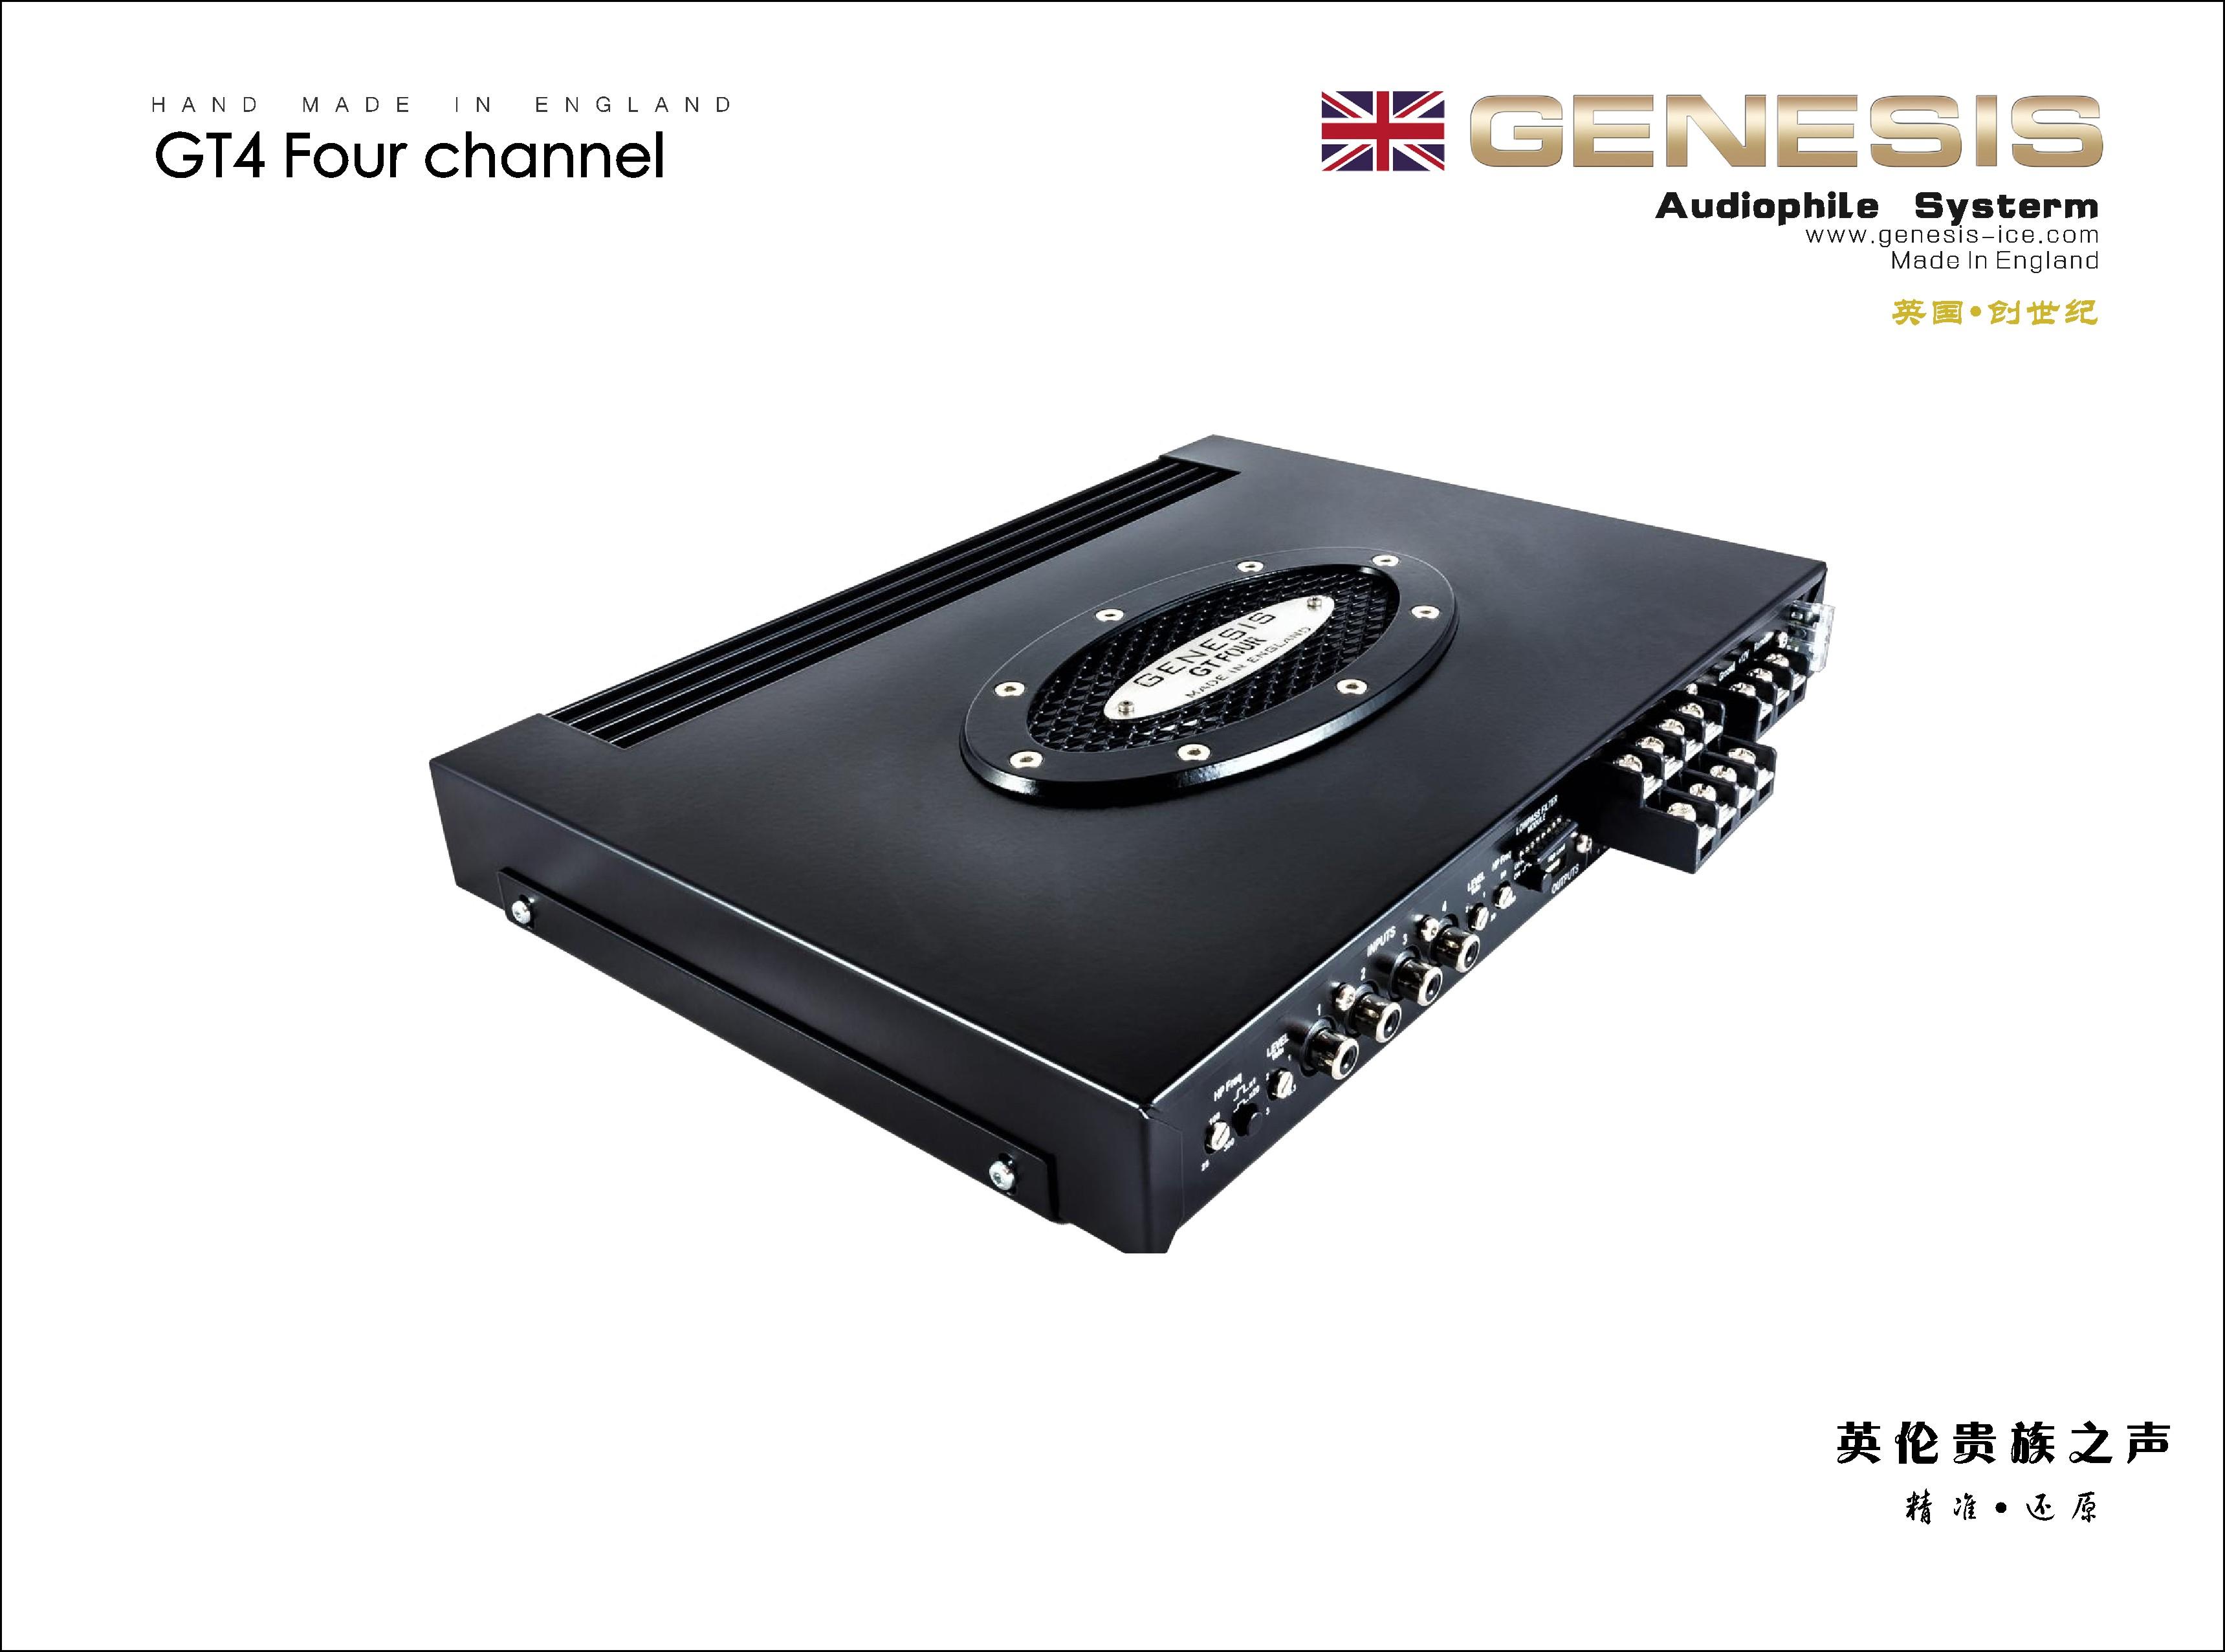 GT4 Four channel